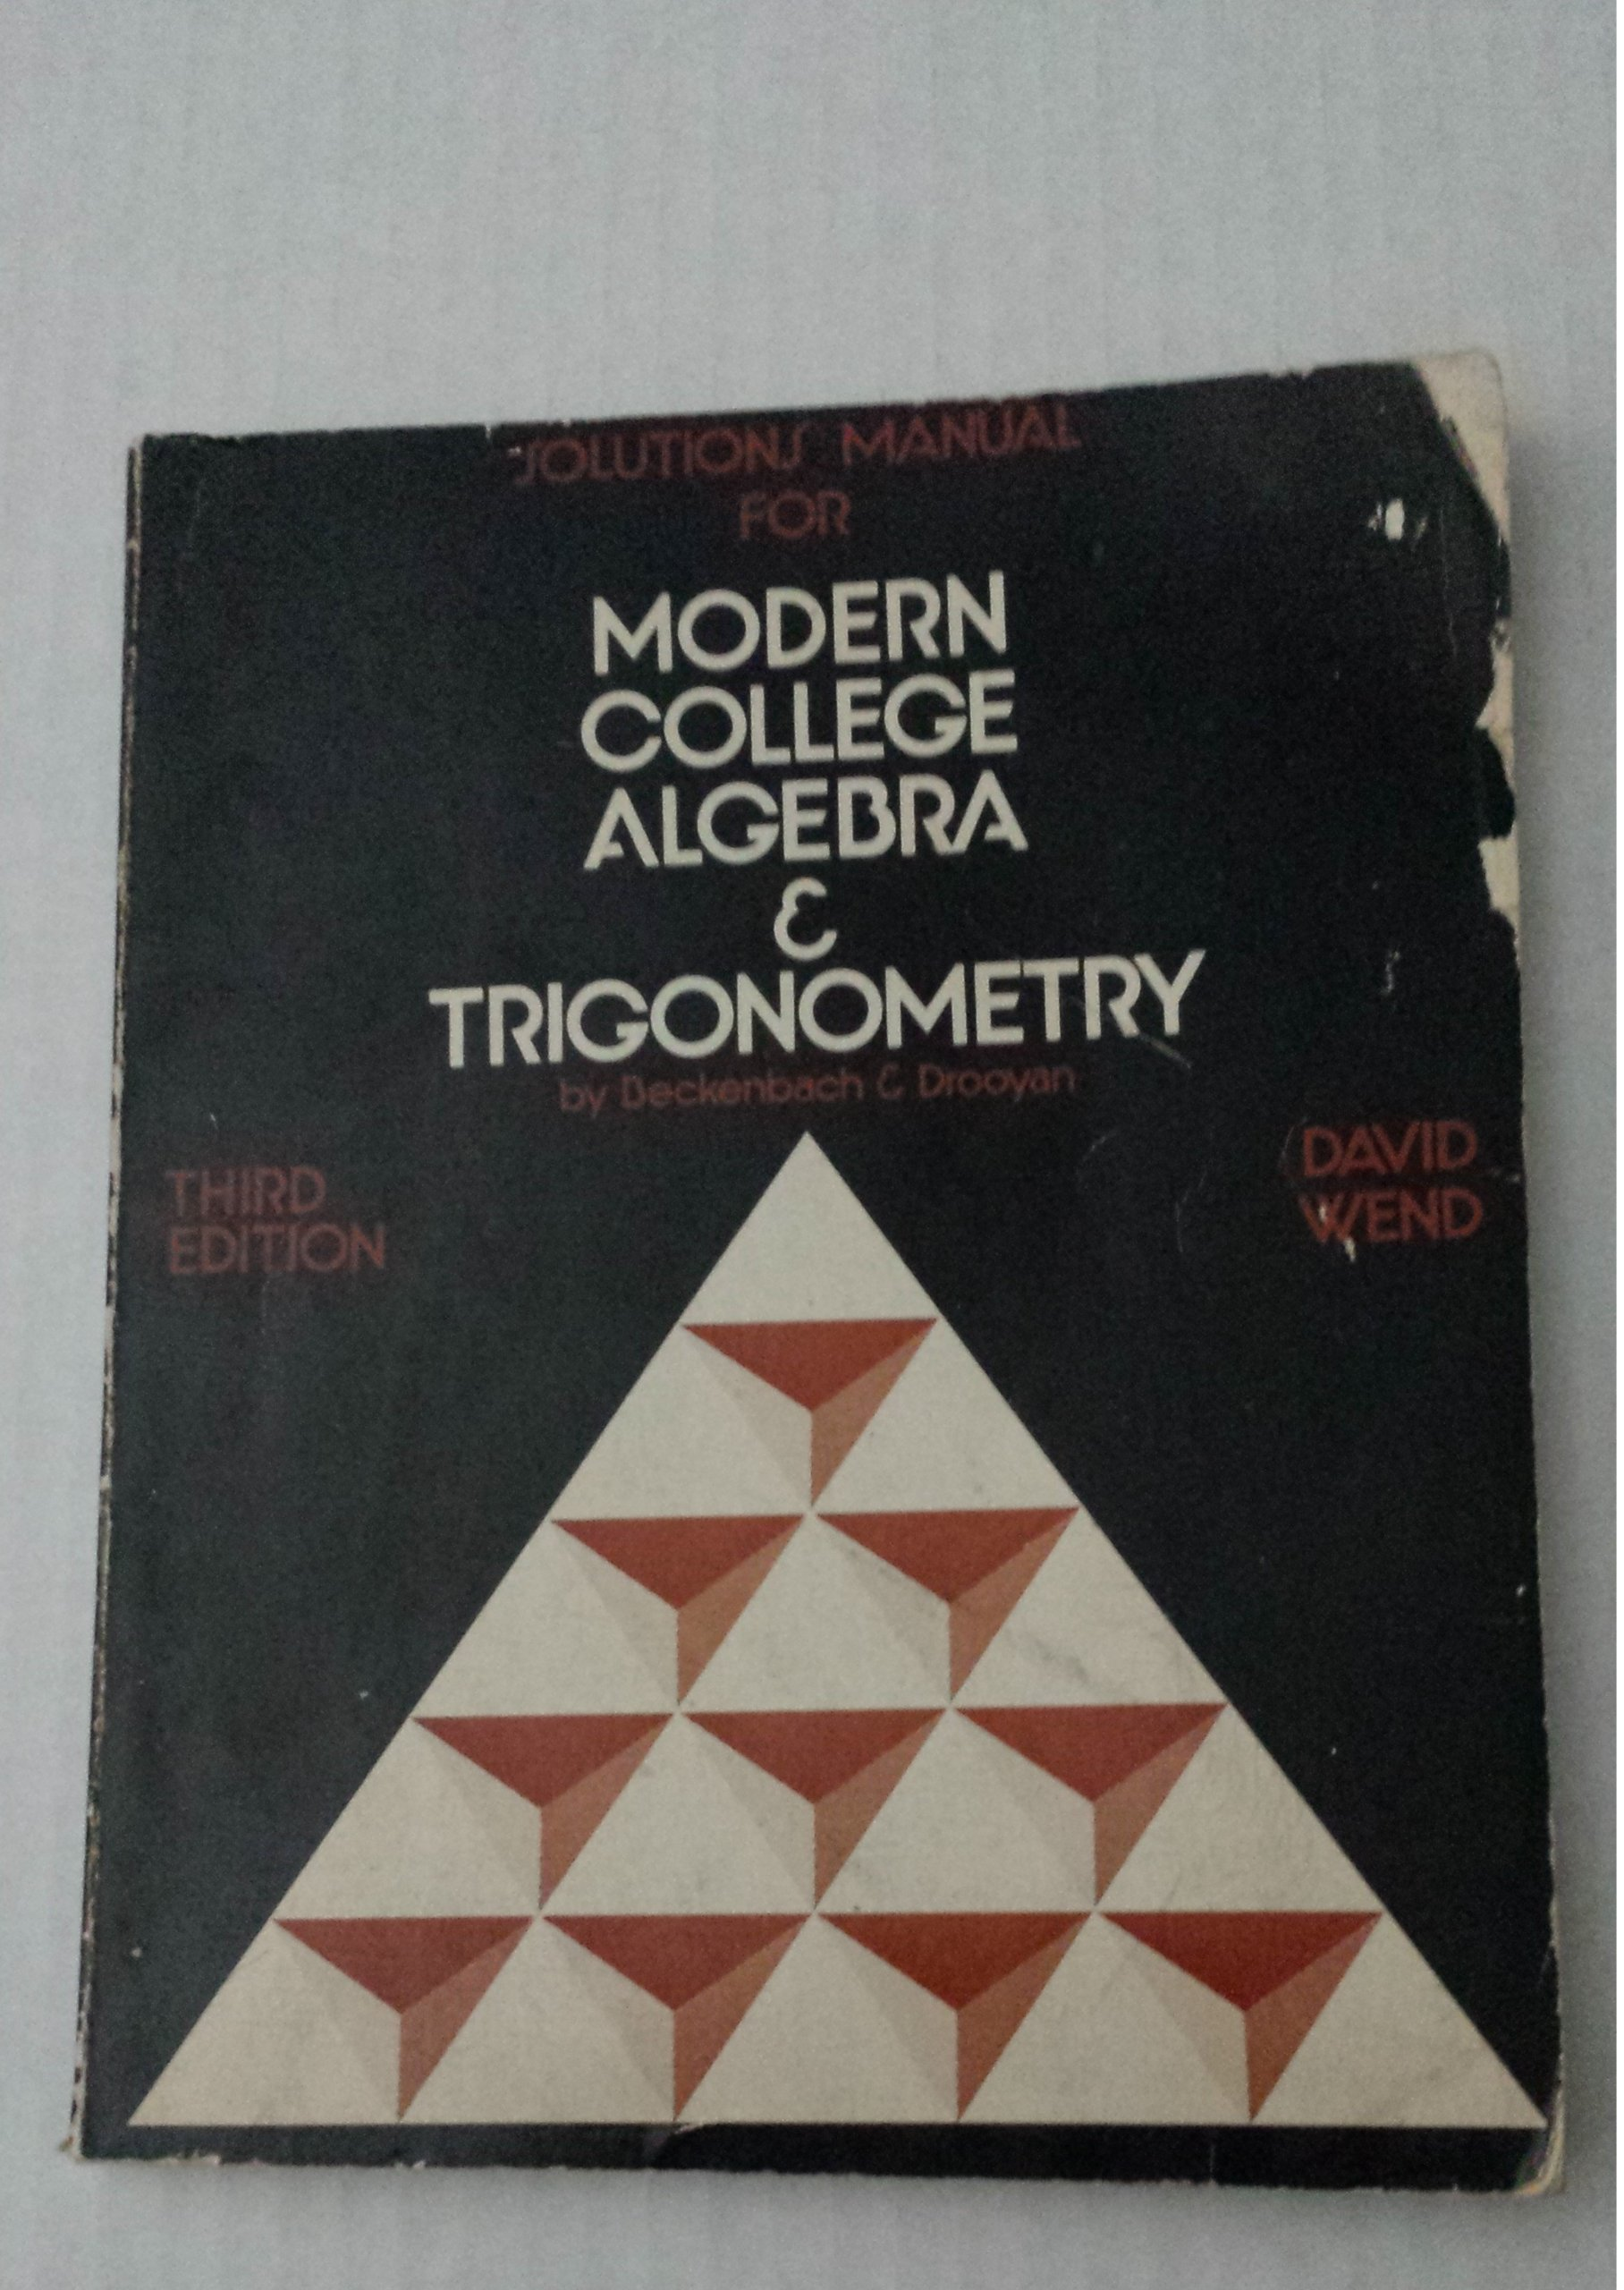 Solutions manual for Modern college algebra and trigonometry, third  edition, : David Wend: Amazon.com: Books